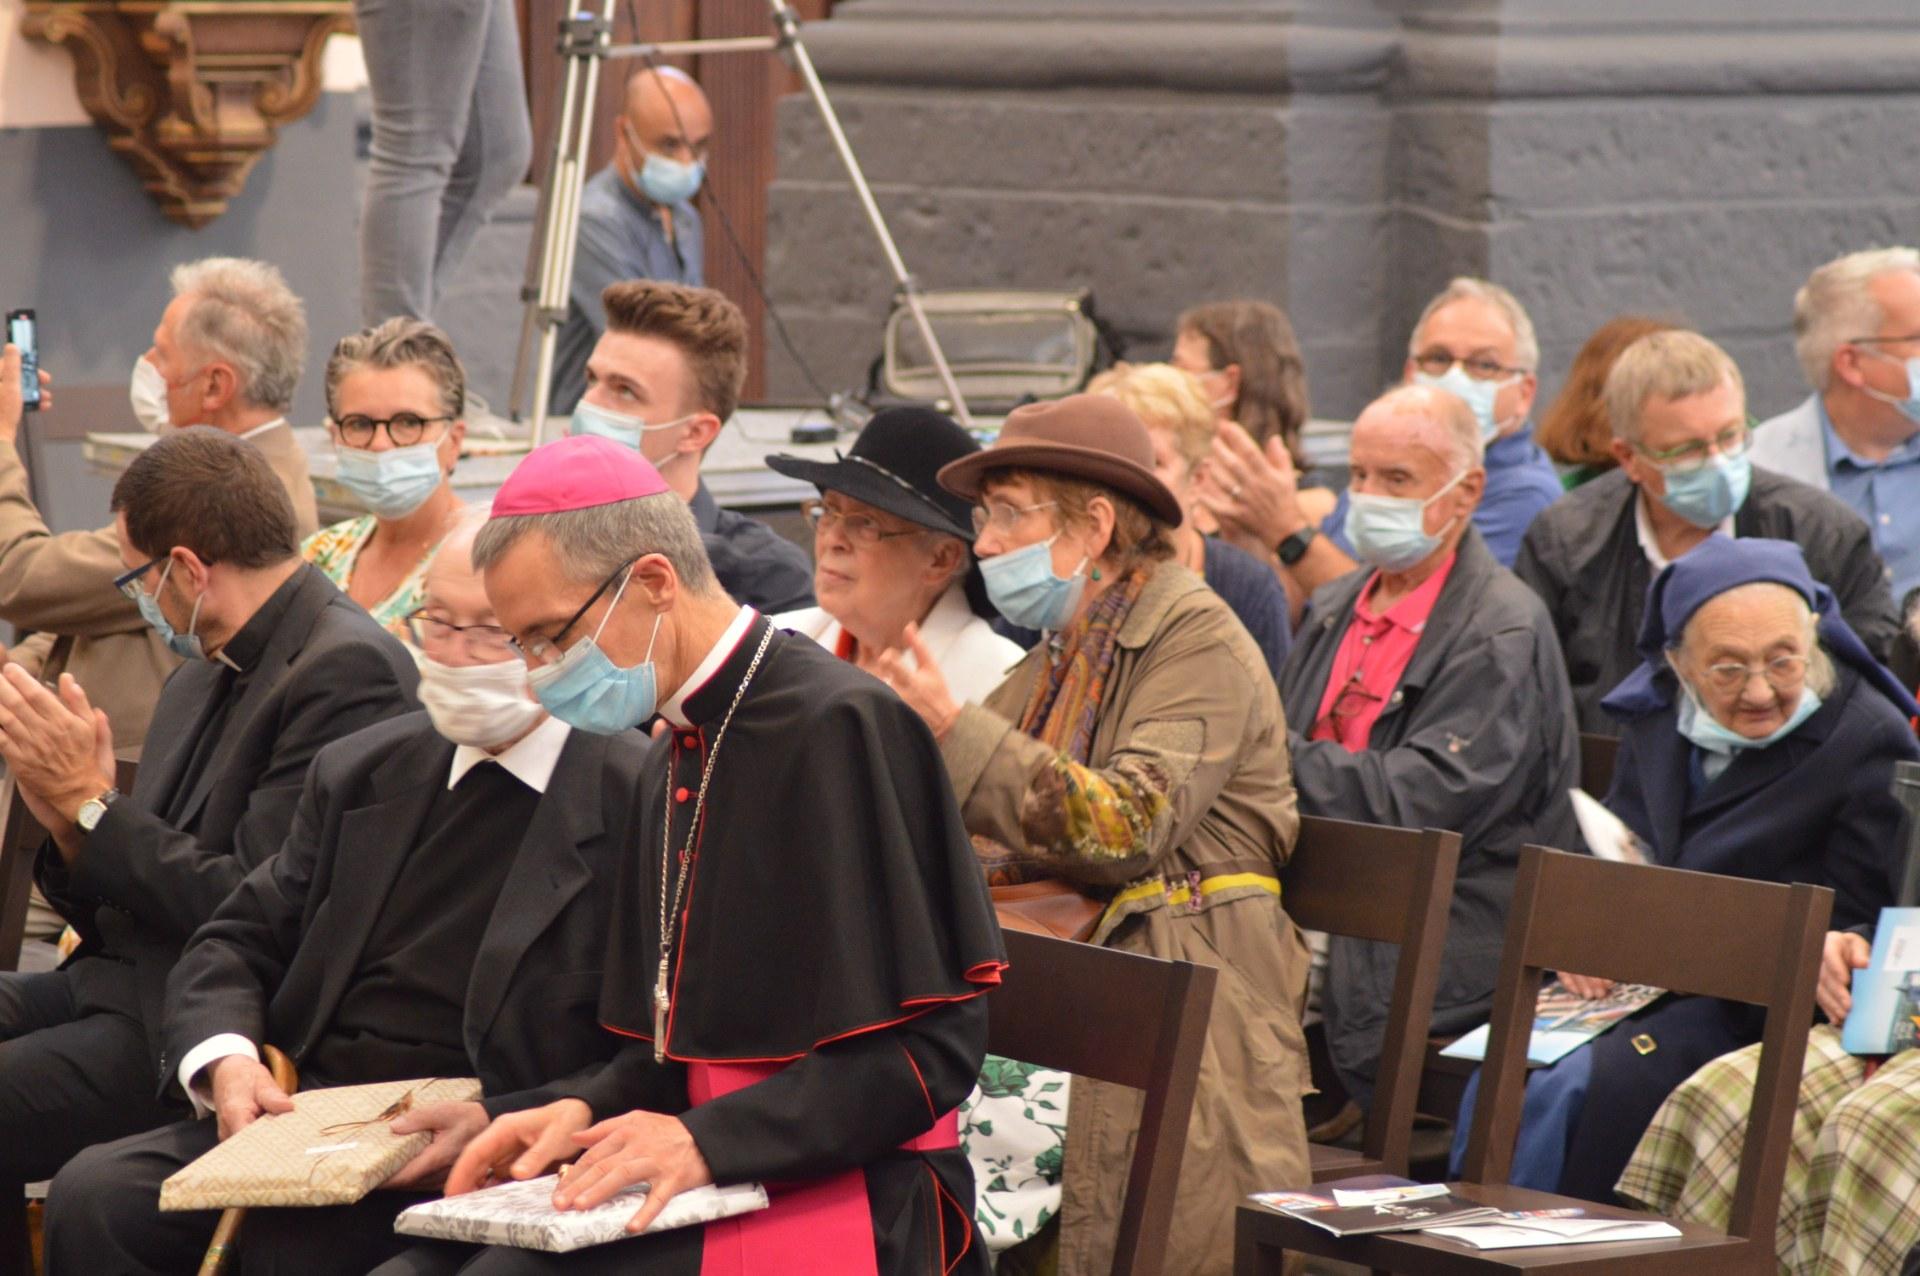 église st martin st amand 110921 46